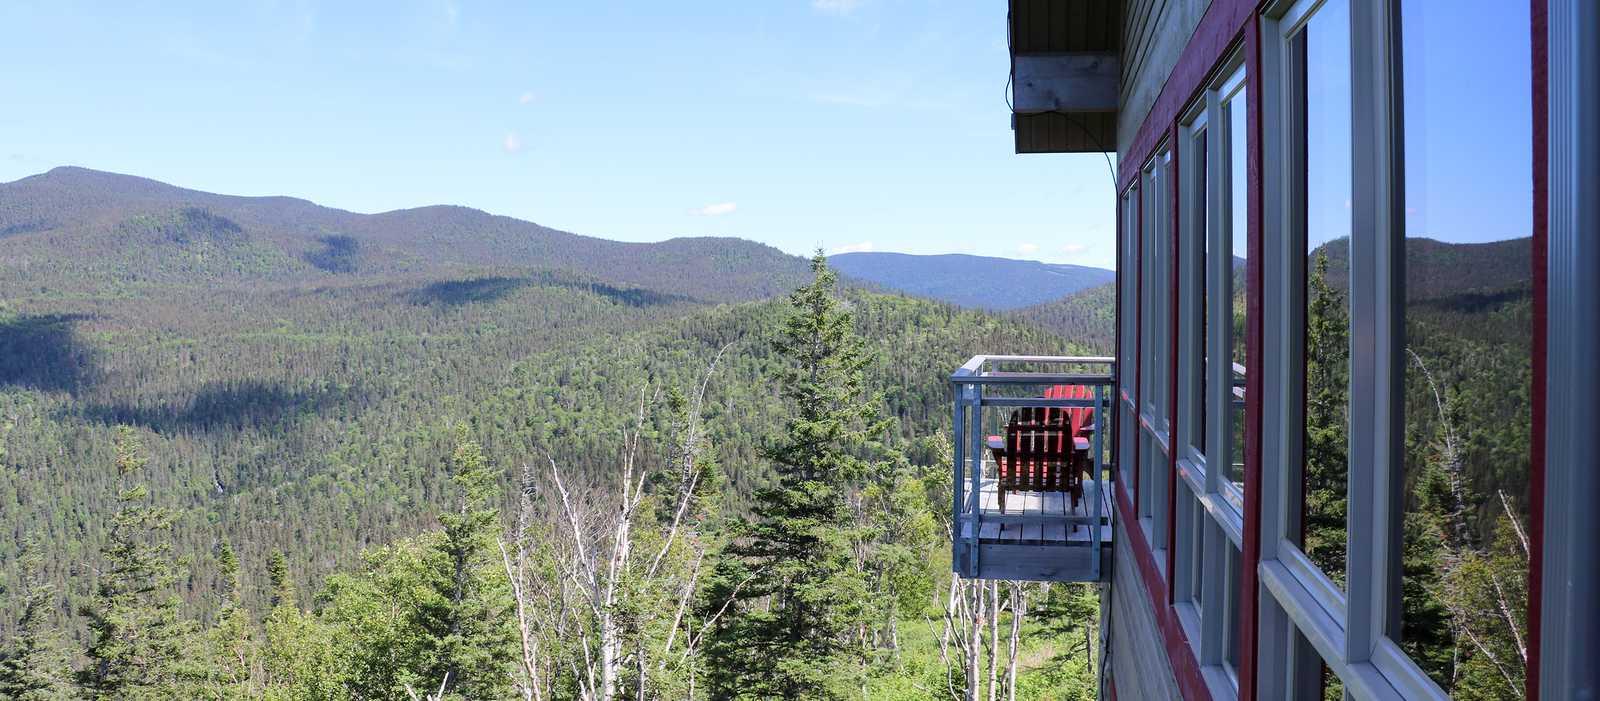 Chic-Chocs Mountain Lodge